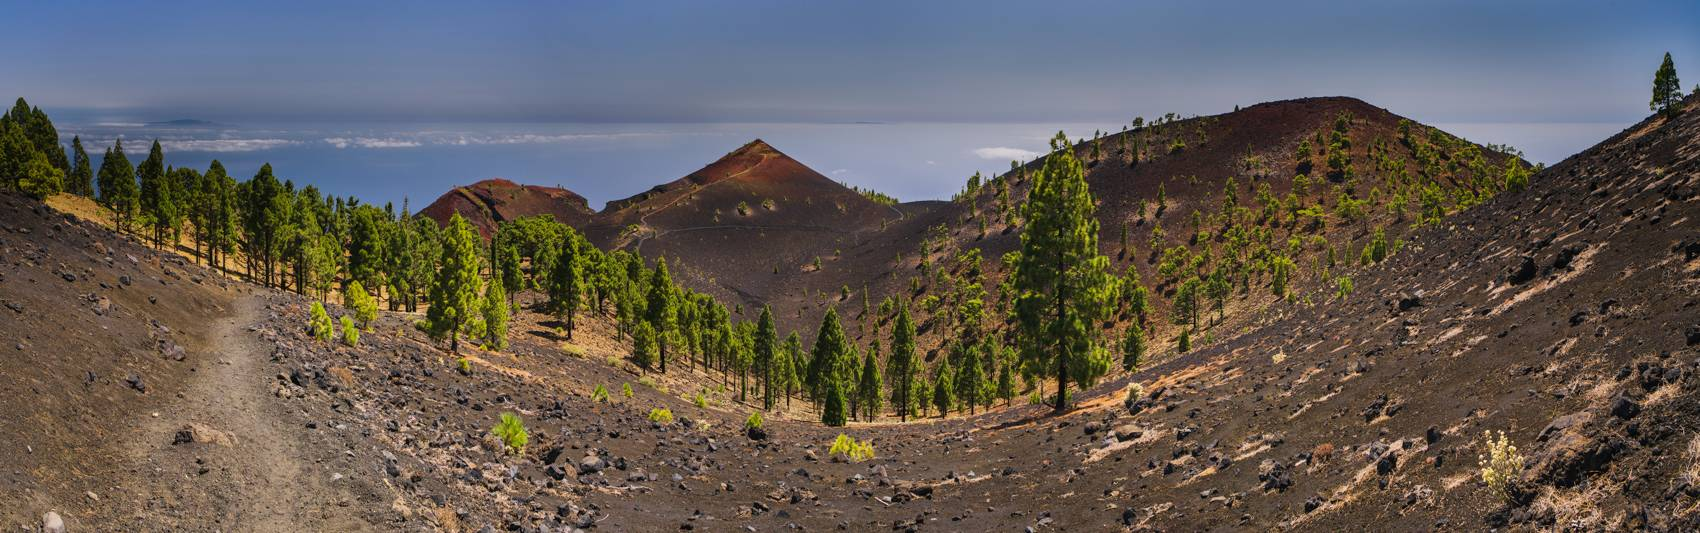 Photo Voyages : Îles Canaries #17